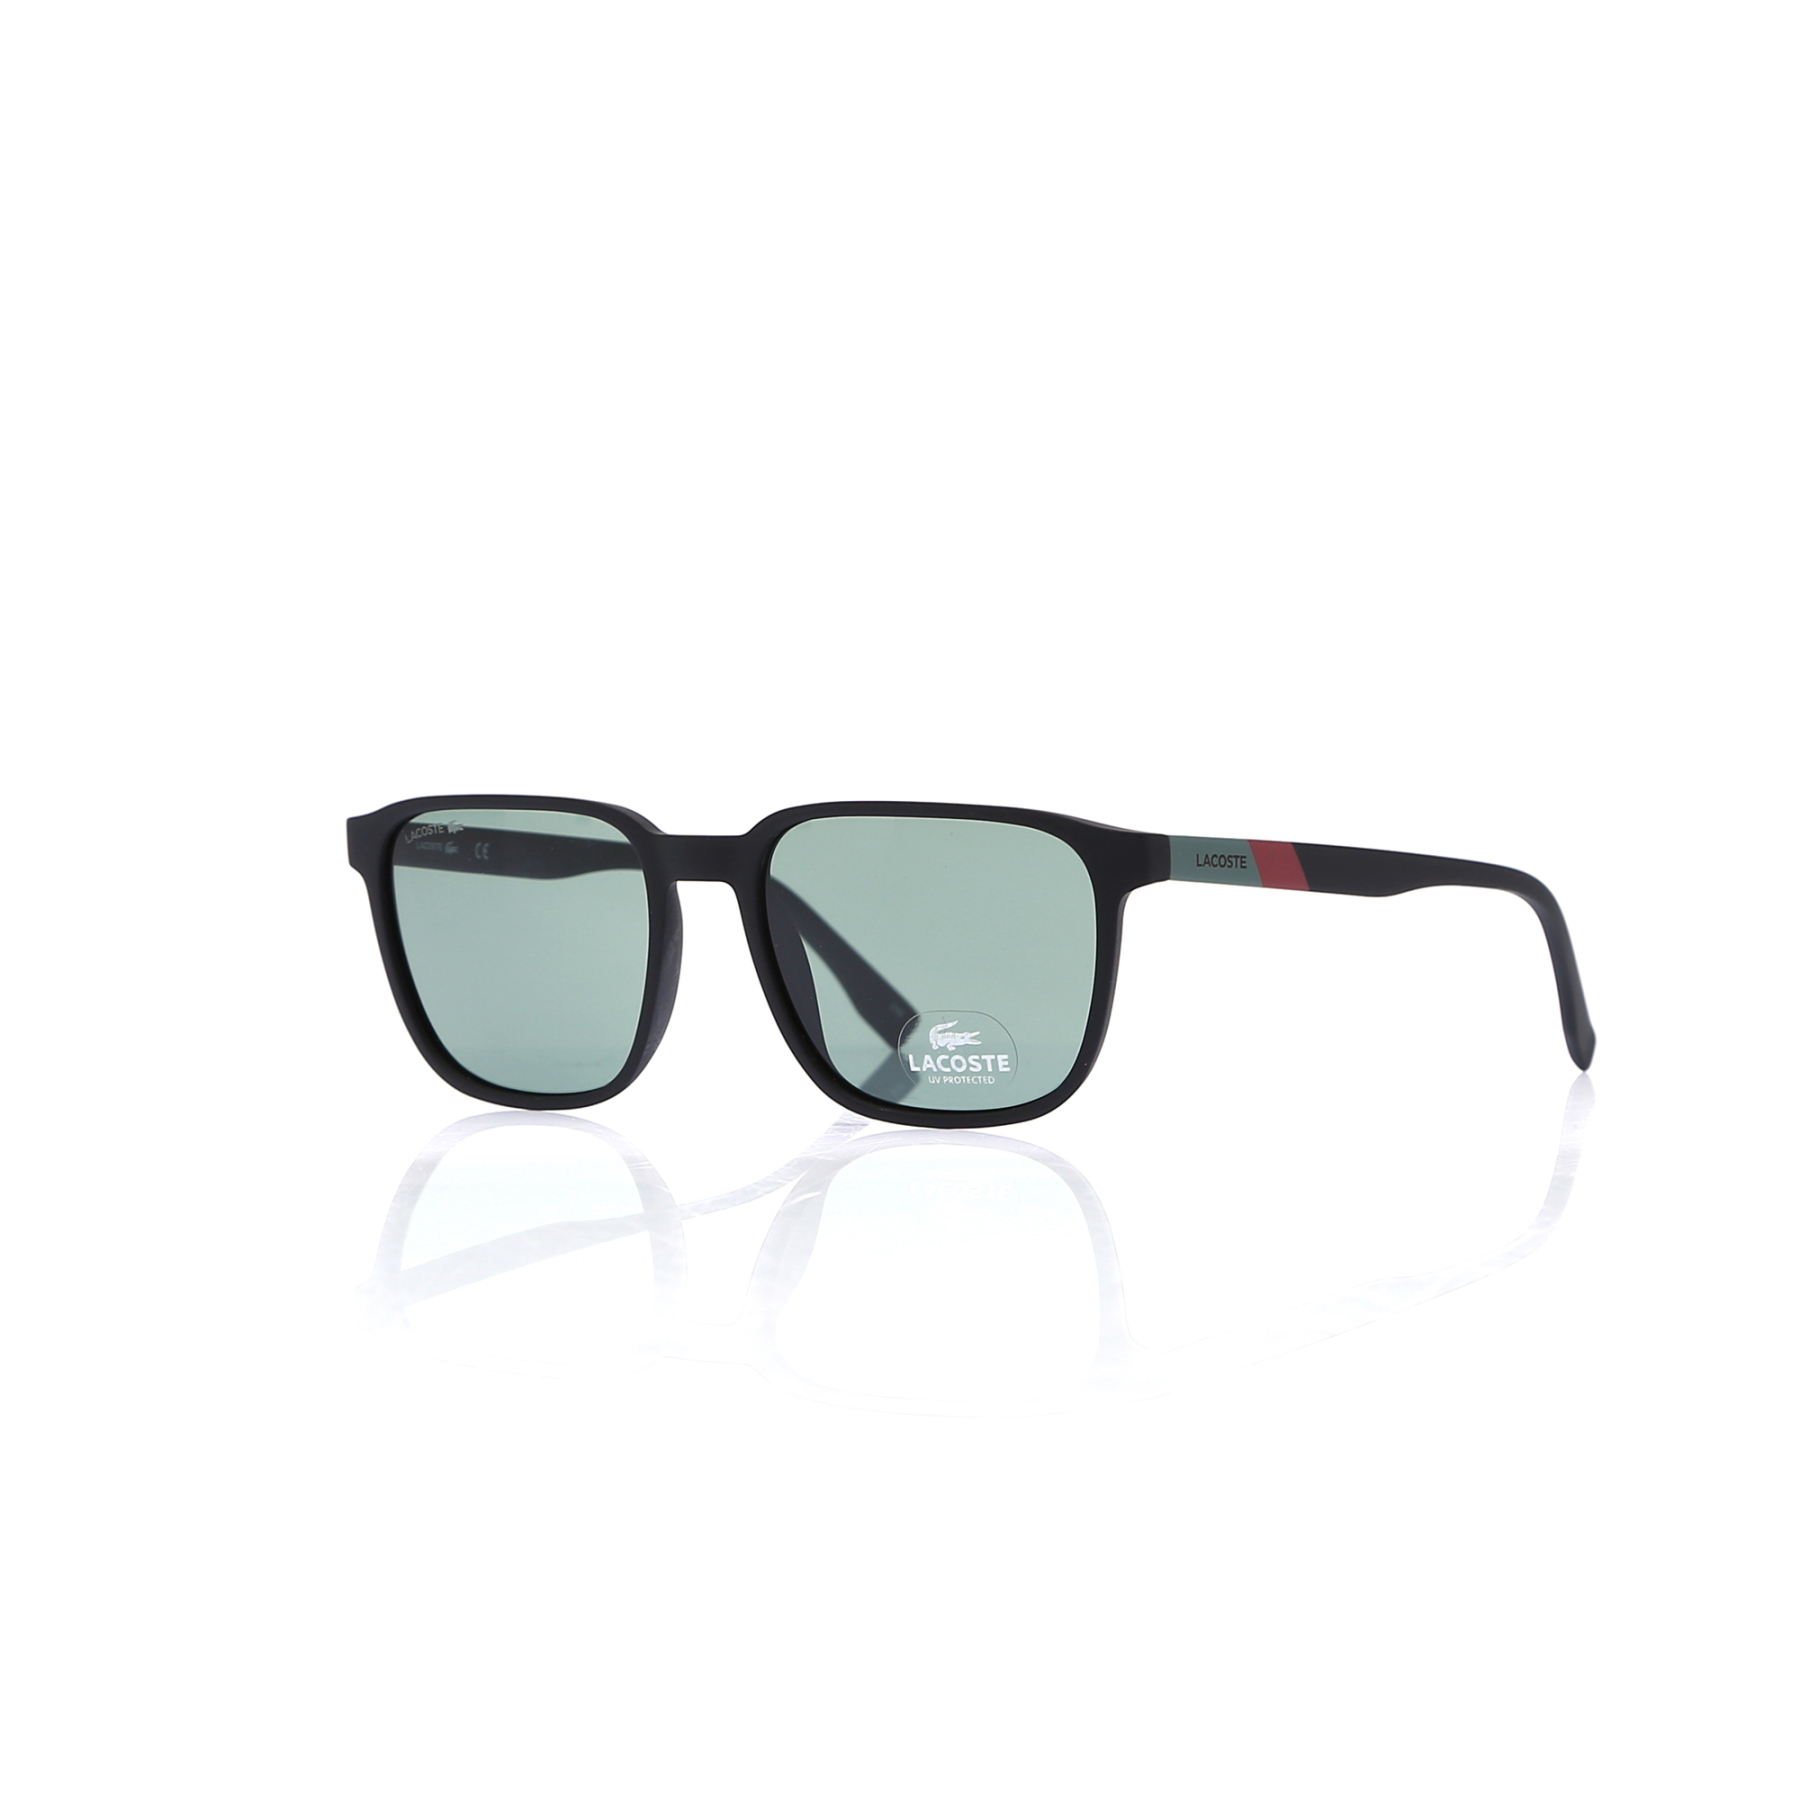 Men's sunglasses lcc 873 001 bone black organic square square 55-18-145 lacoste